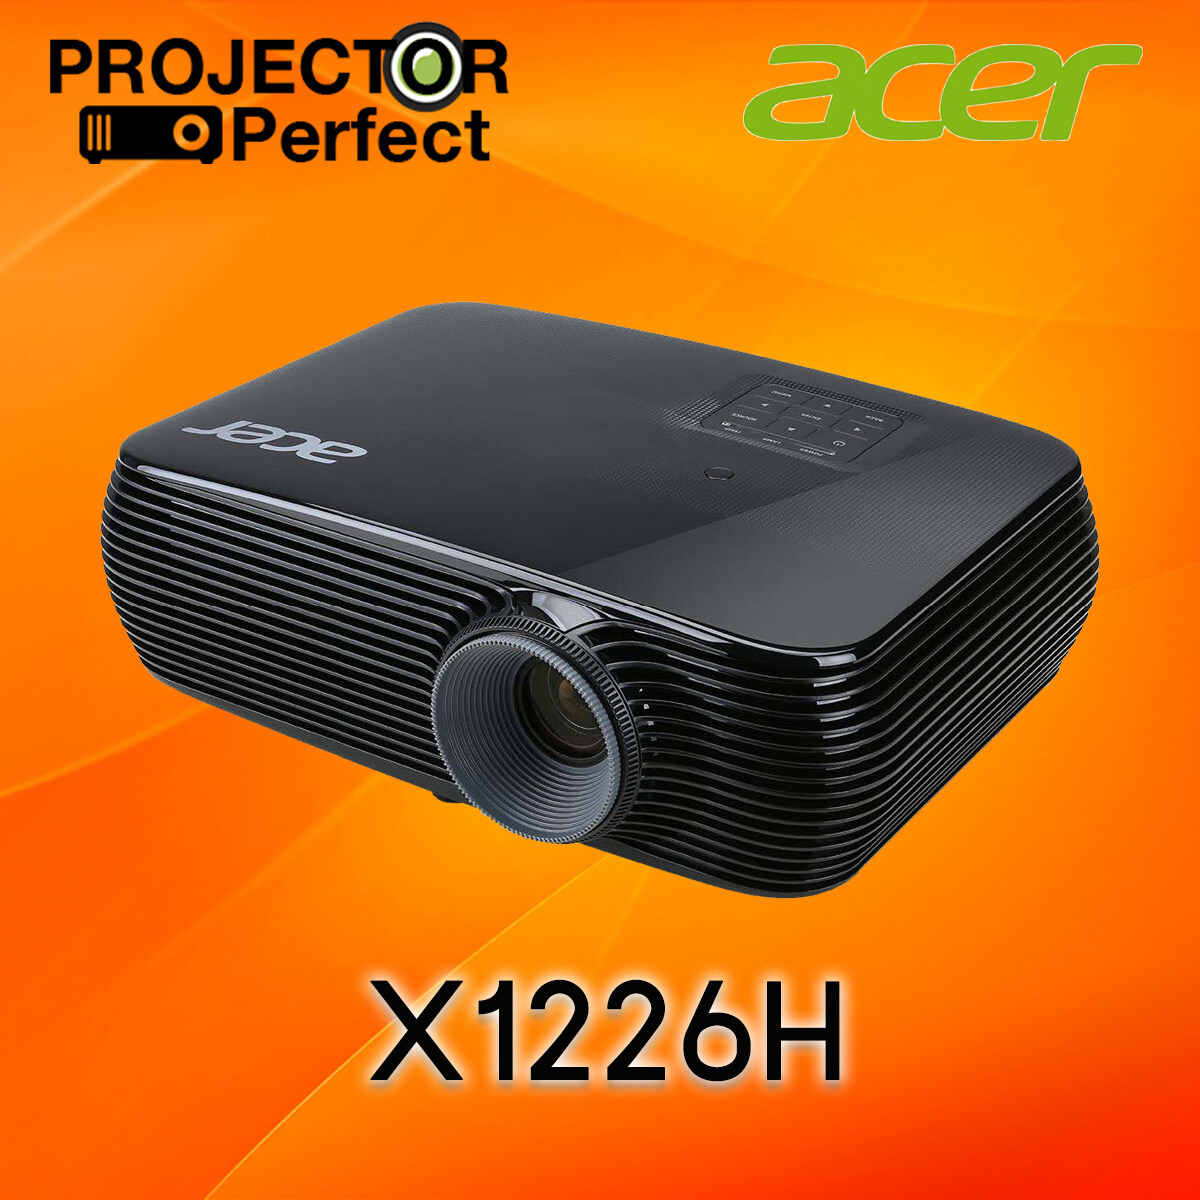 Acer X1226h Dlp Projector เครื่องฉายภาพโปรเจคเตอร์ ยี่ห้อ เอเซอร์ รุ่น X1226h (4,000 Ansi Lumens/xga) ความสว่างสูง ประกัน 3 ปีเต็ม.